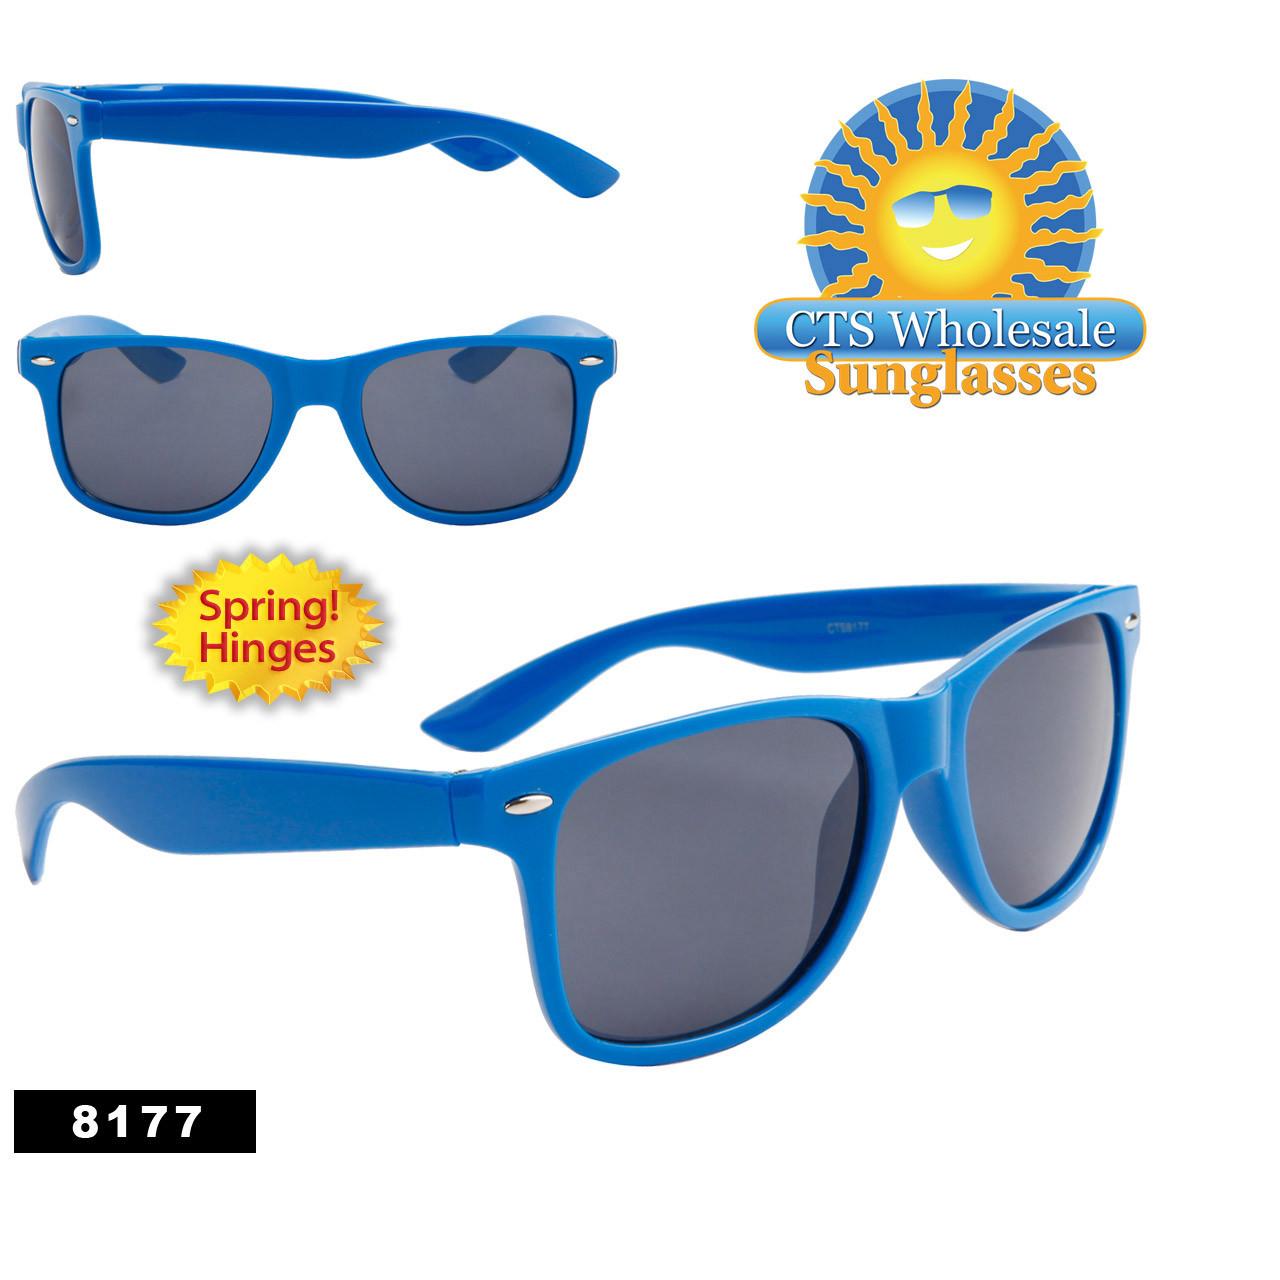 Blue California Classics Sunglasses Wholesale - Style #8177 Spring Hinge (12 pcs.)